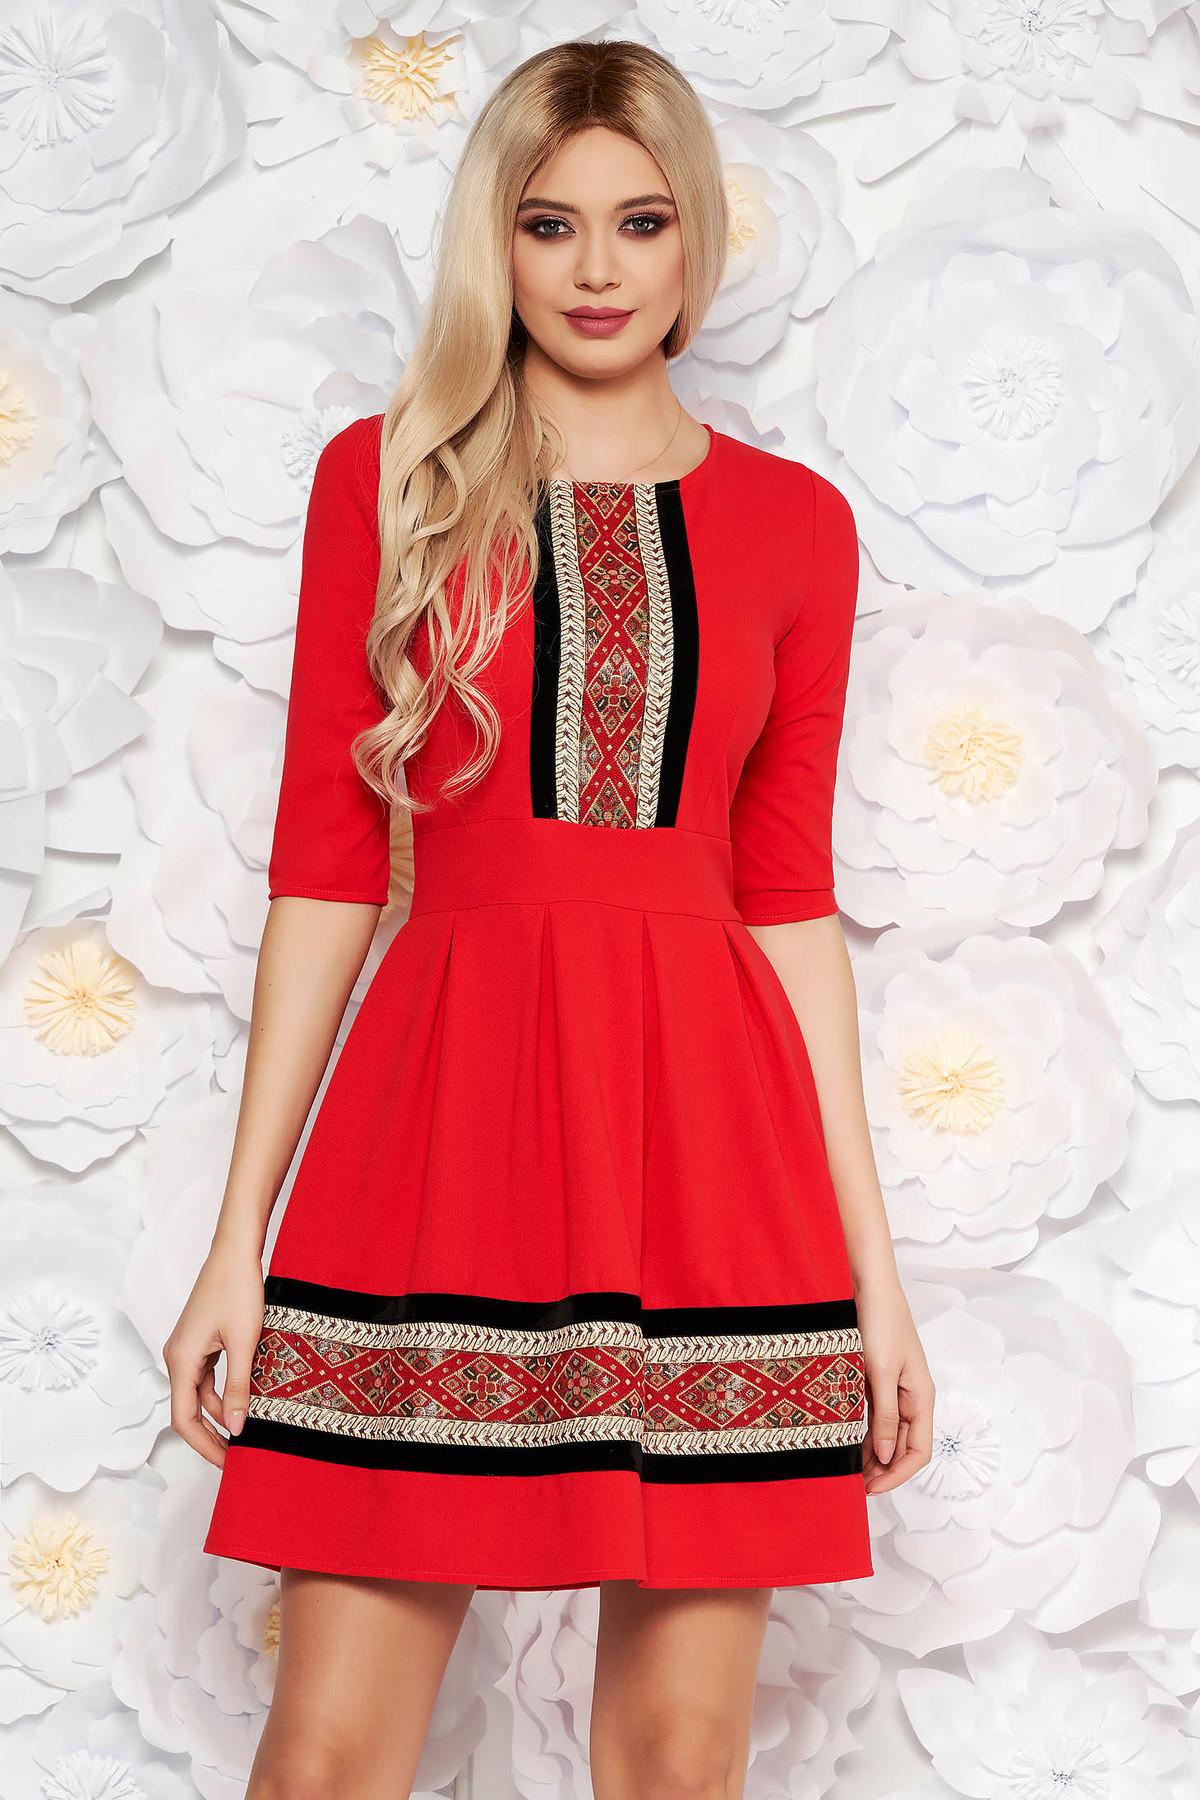 f57c7b11b1 Piros elegáns midi harang ruha rugalmas anyag háromnegyedes ujjú